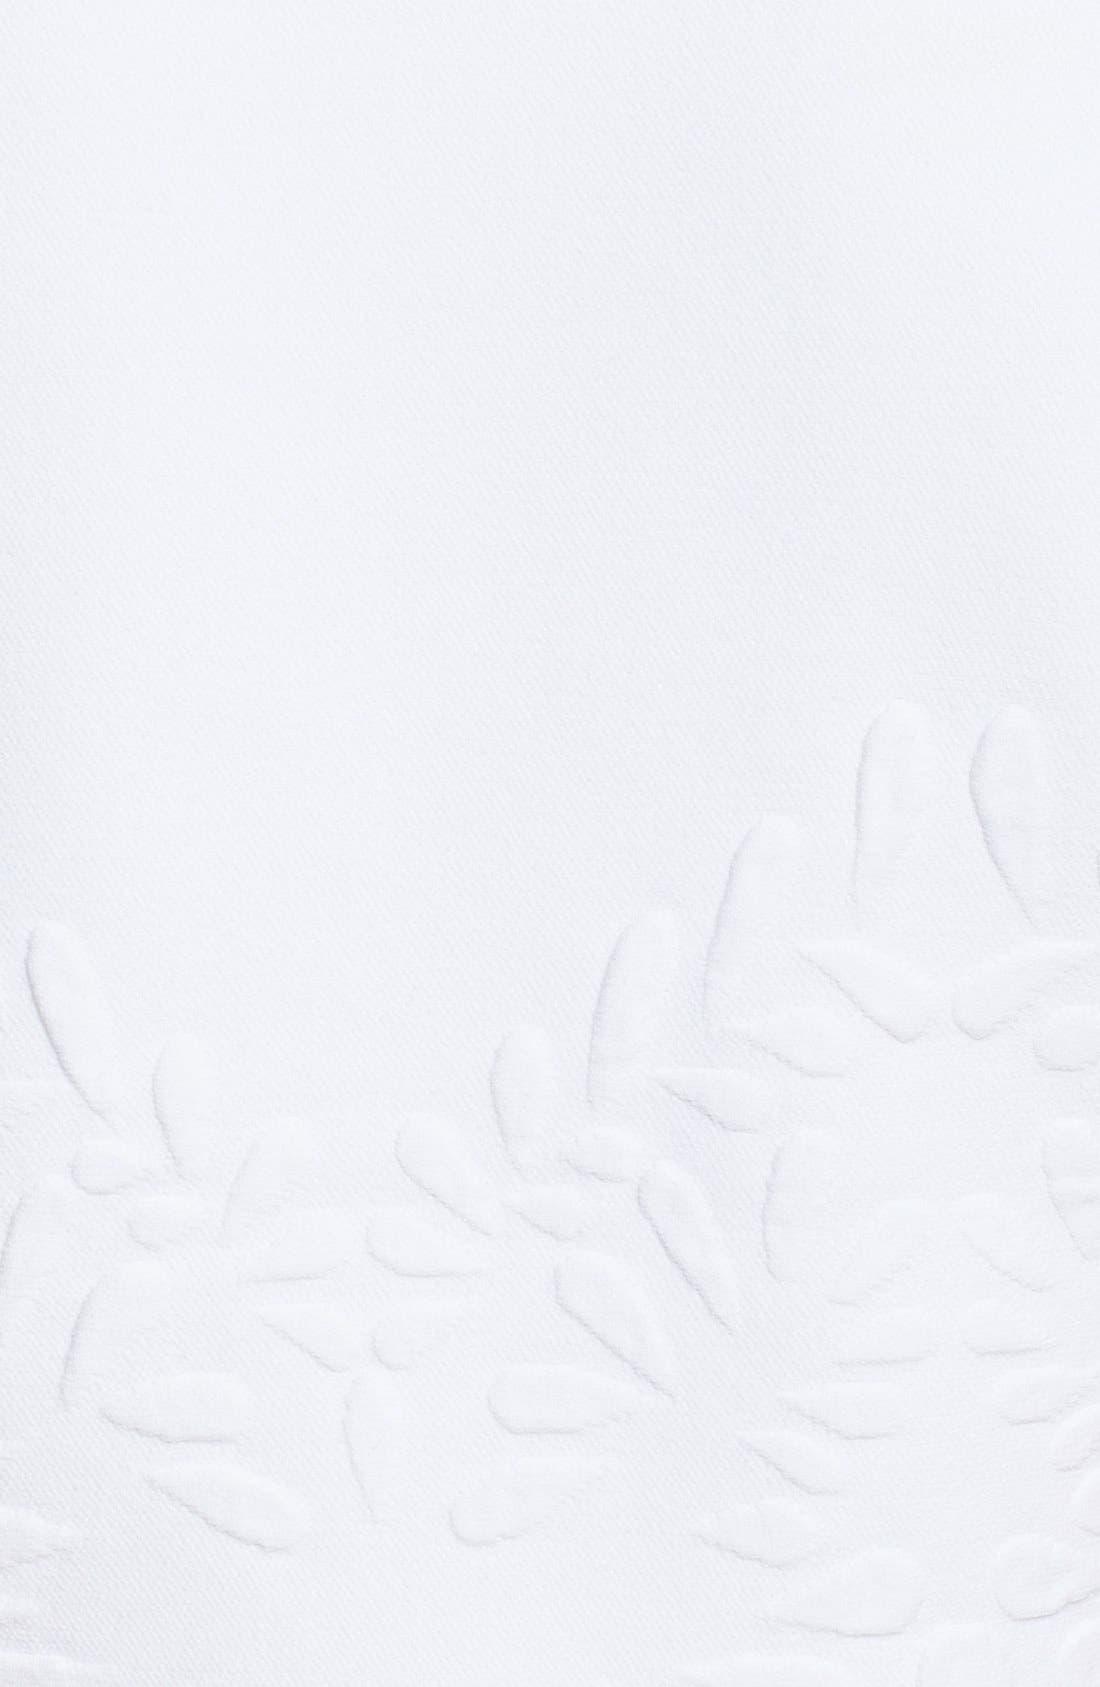 Alternate Image 3  - Alexander McQueen Embossed Jacquard Knit Crop Top